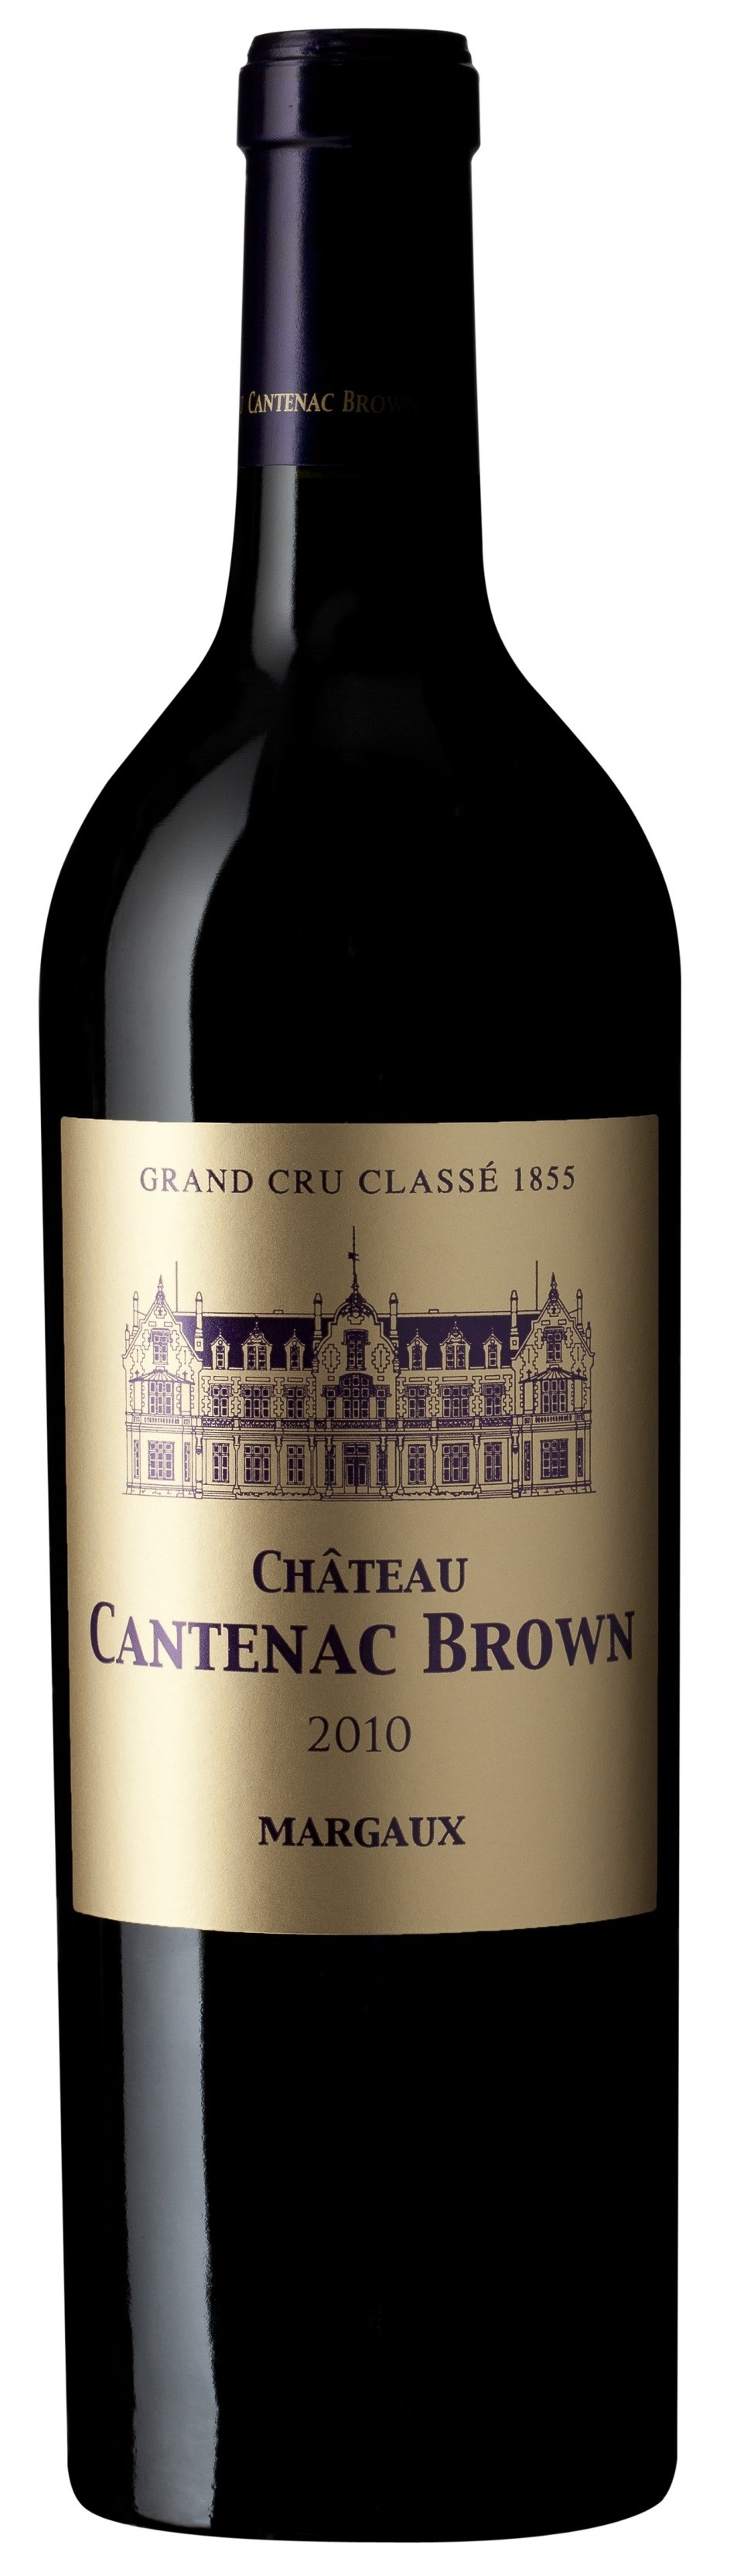 Chateau Cantenac Brown 2016, 1,5l,  Margaux